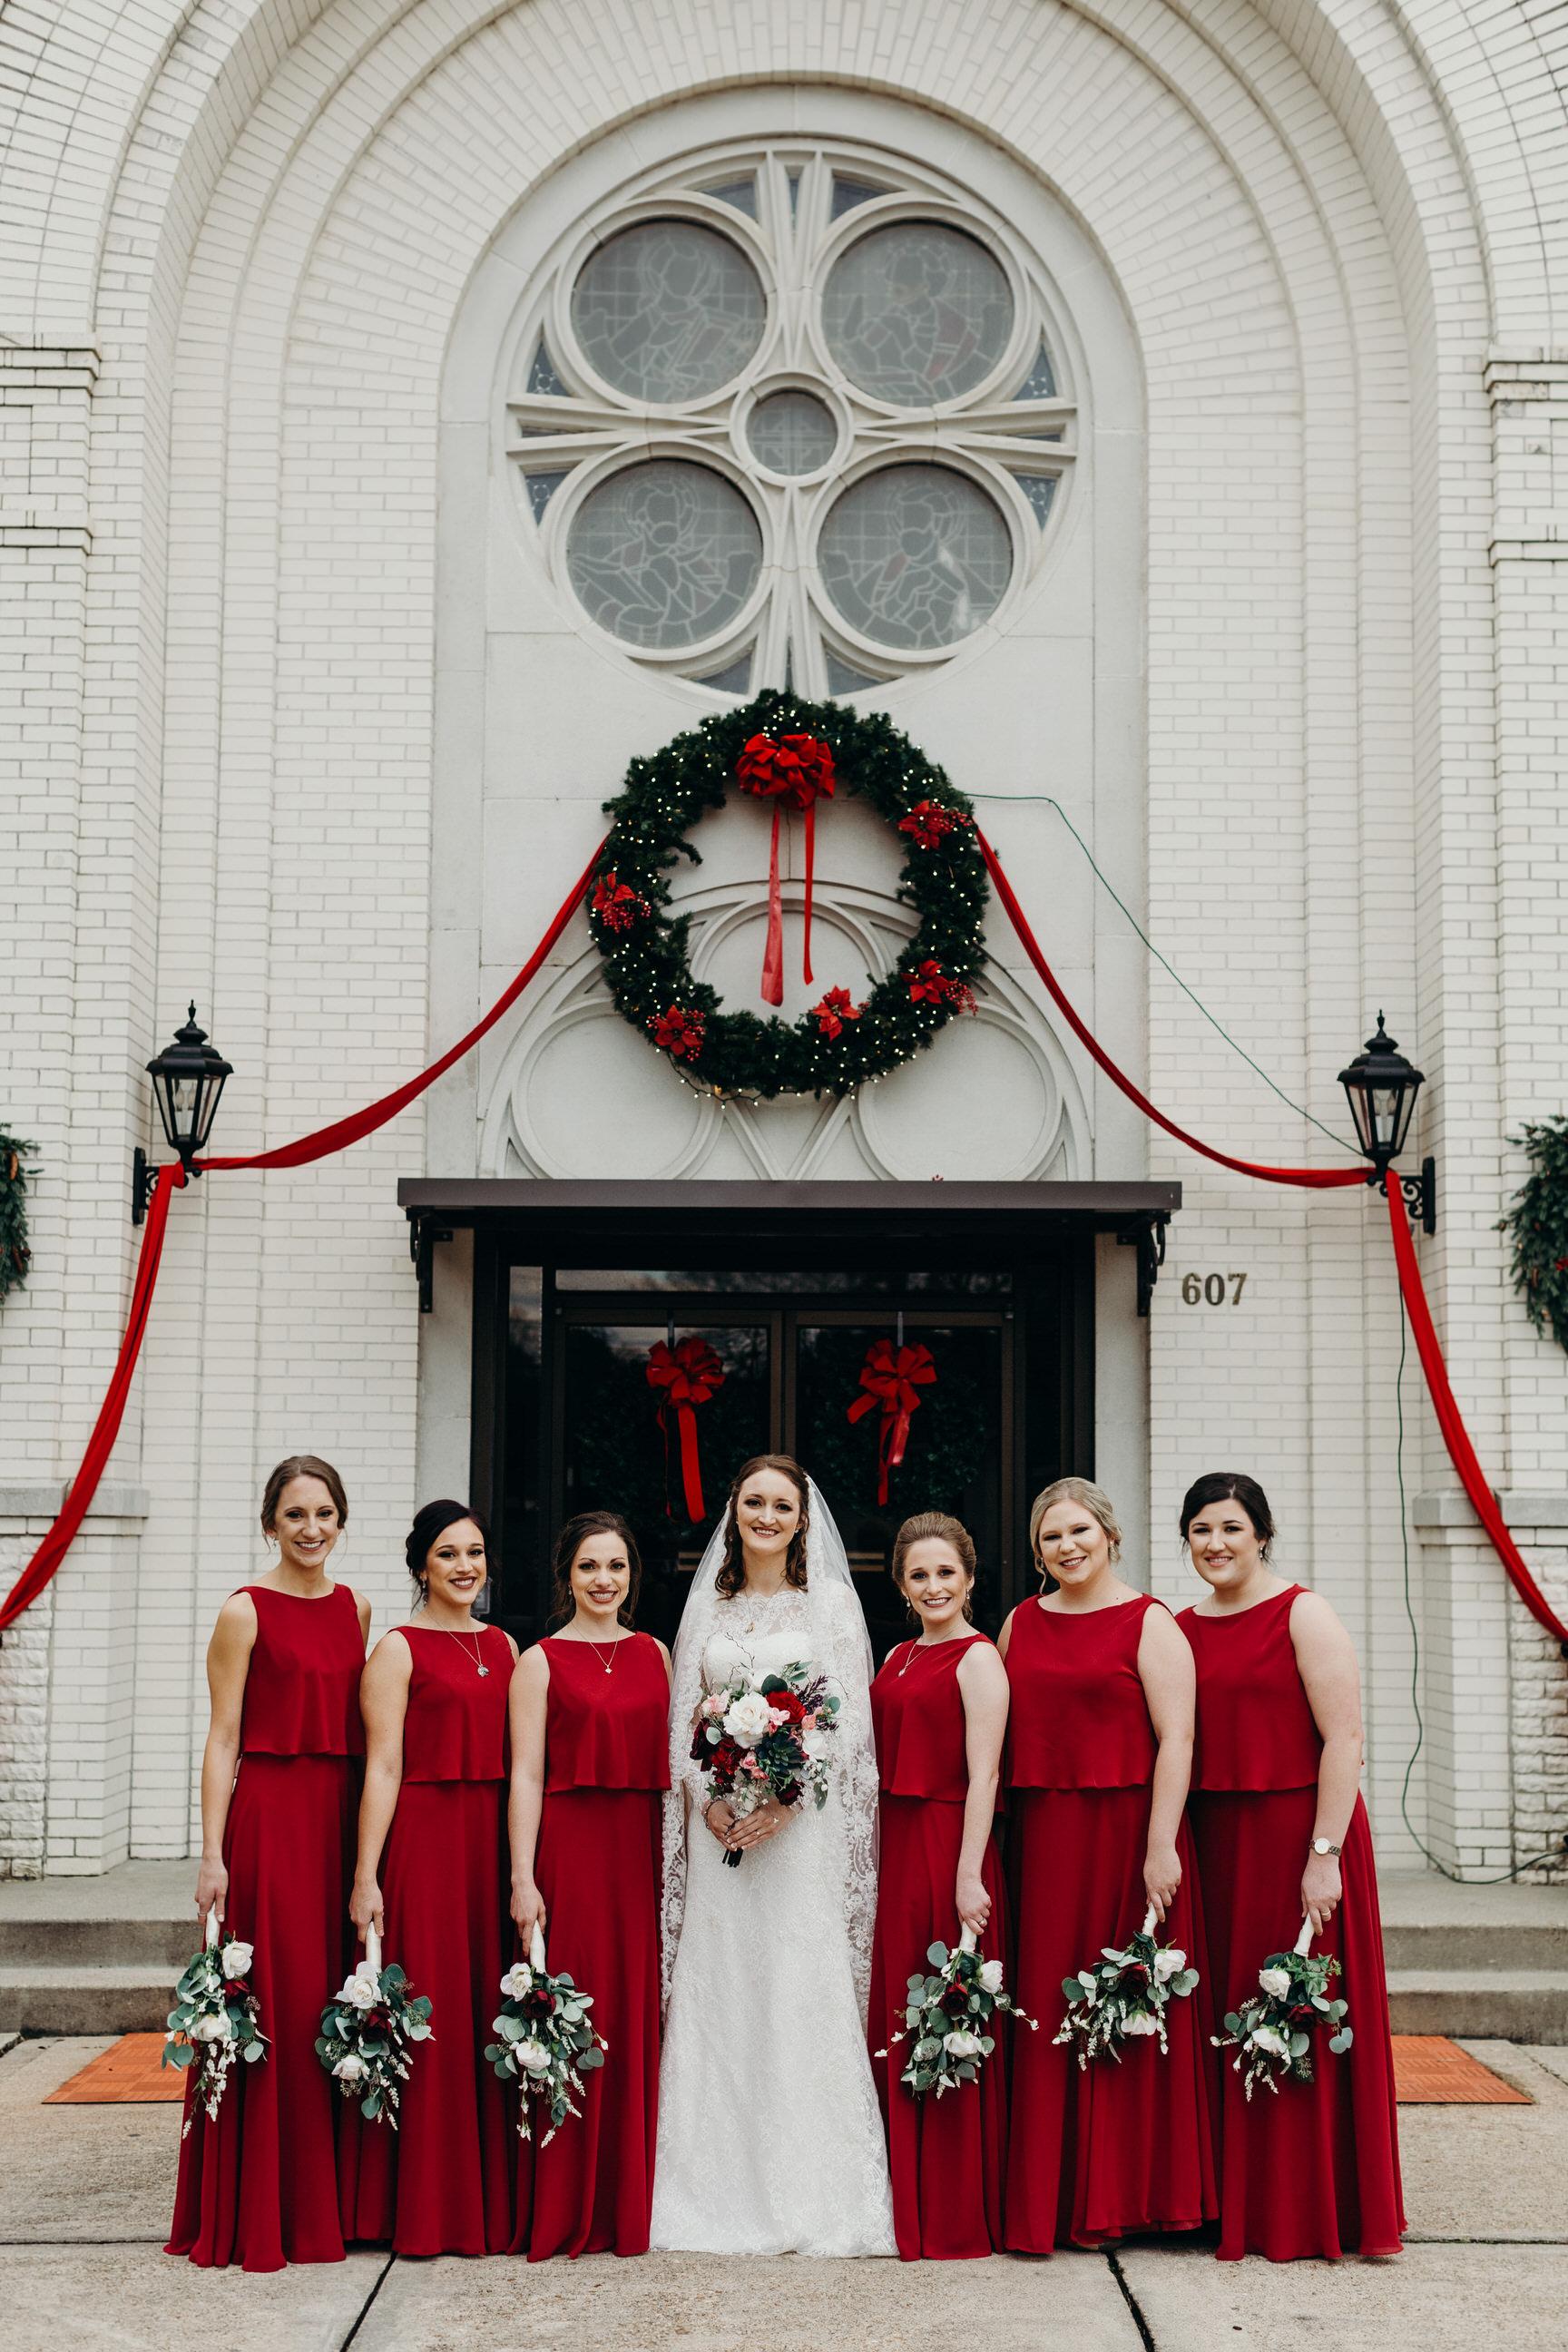 Louisiana Photography & Videography Wedding